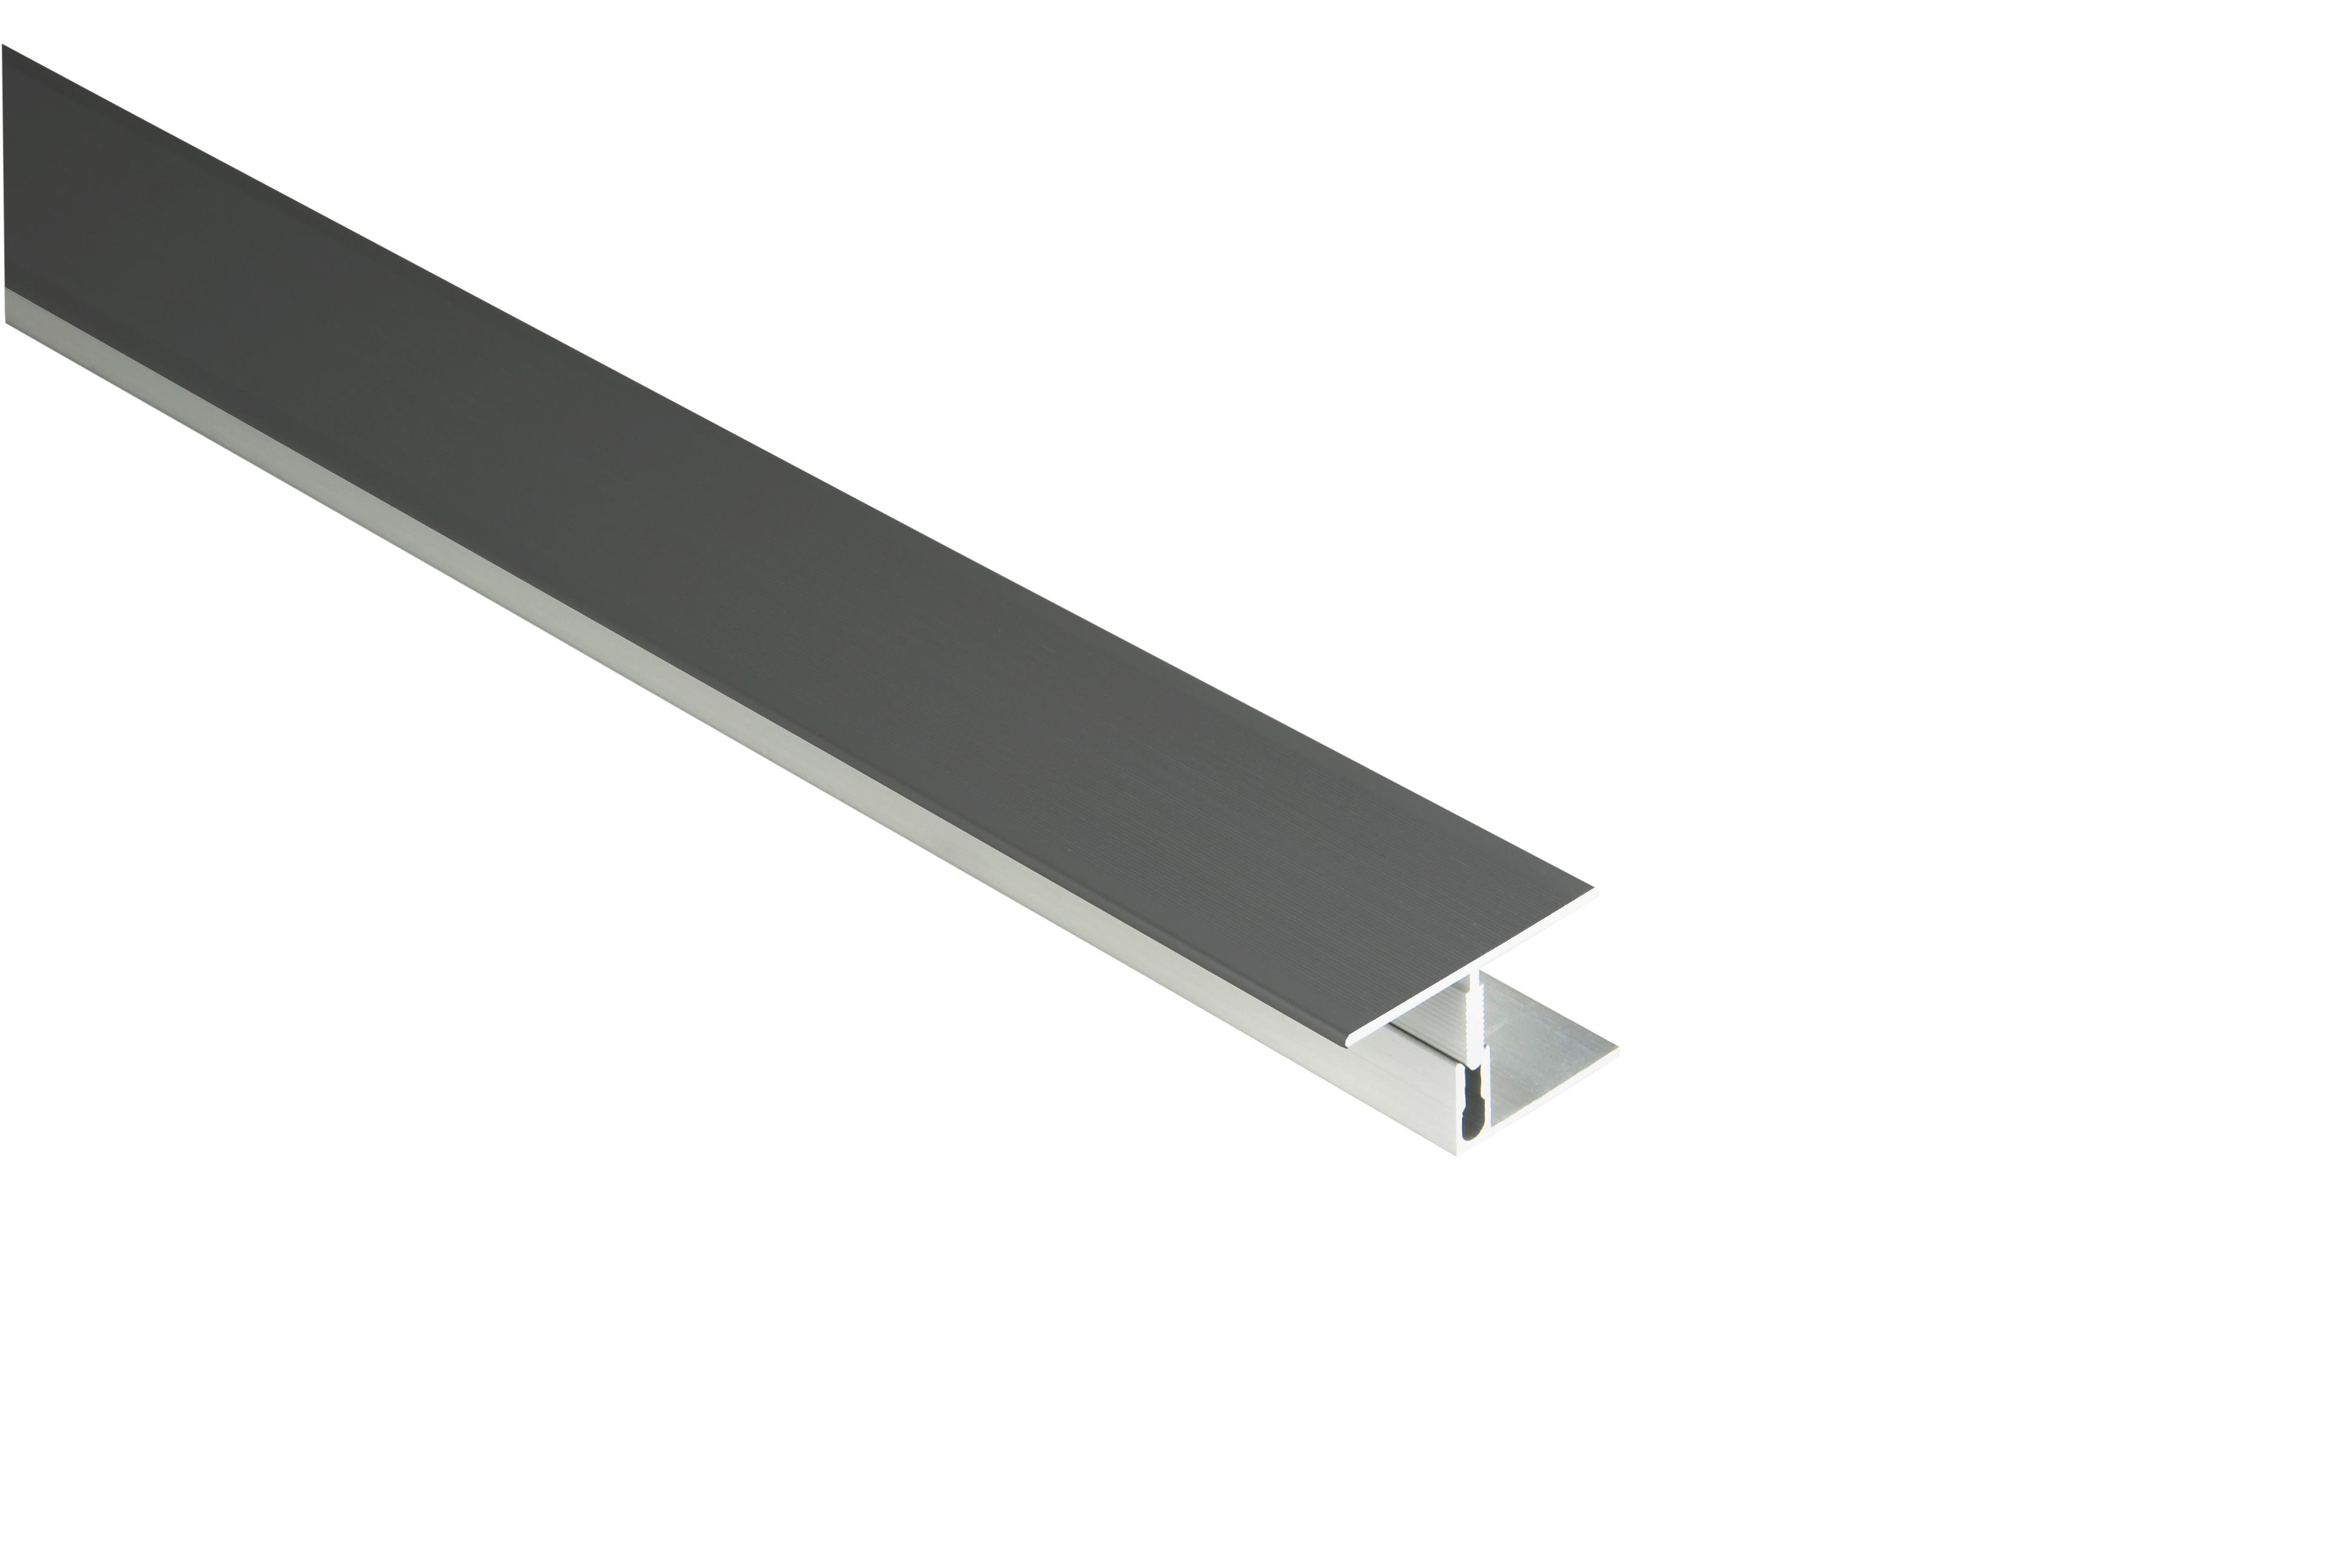 Kovalex Aluminium Übergangsprofil mit Befestigungsprofil - Farbe: Anthrazit - Abmessung: 60x23x2.500 mm